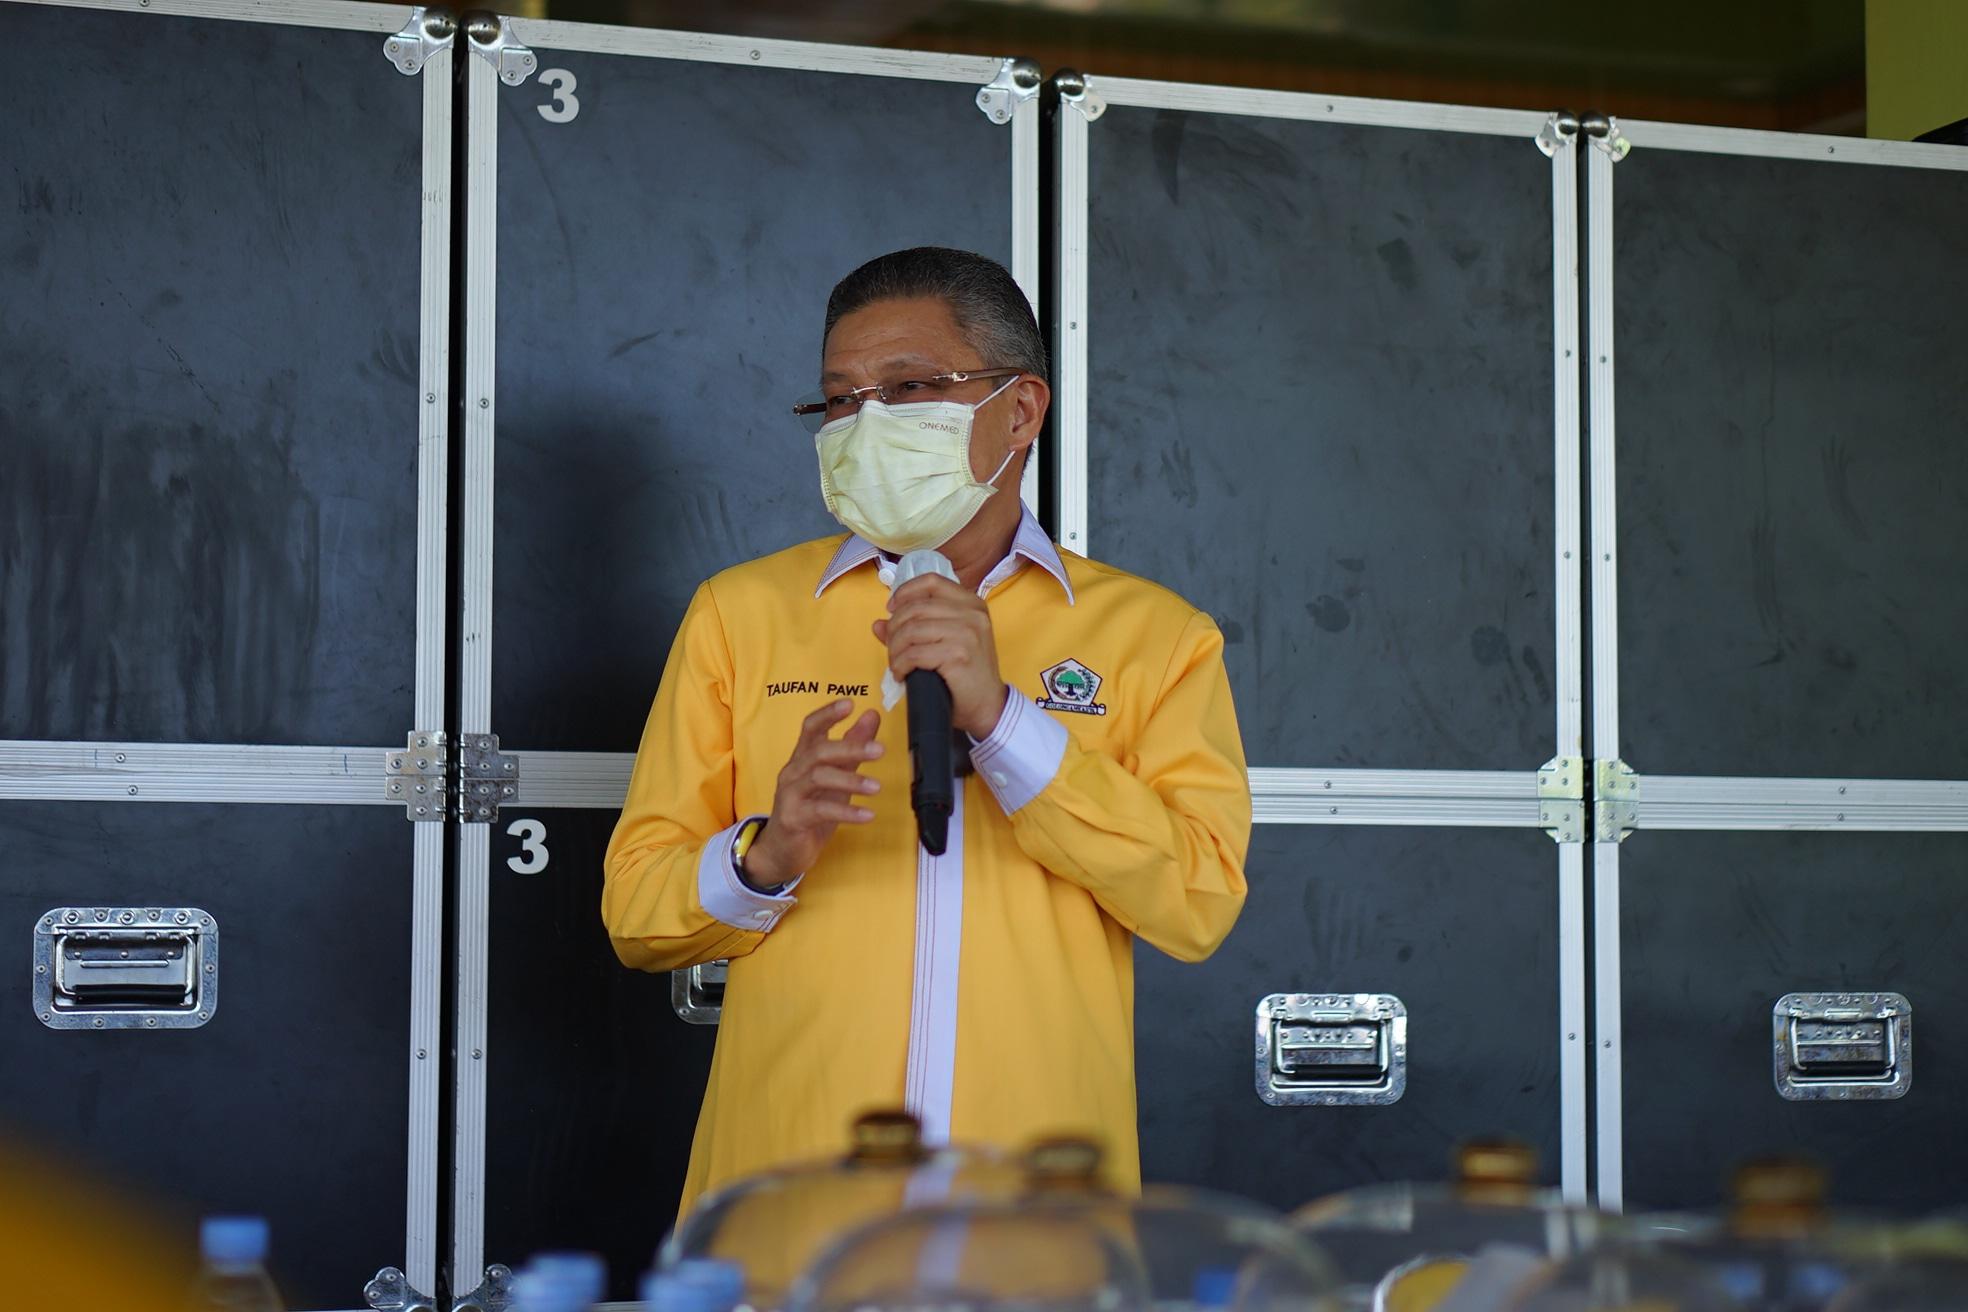 Siap Turun Gunung demi Penuhi Target Kursi Golkar, Taufan Pawe: Jangan Kasi Kendor